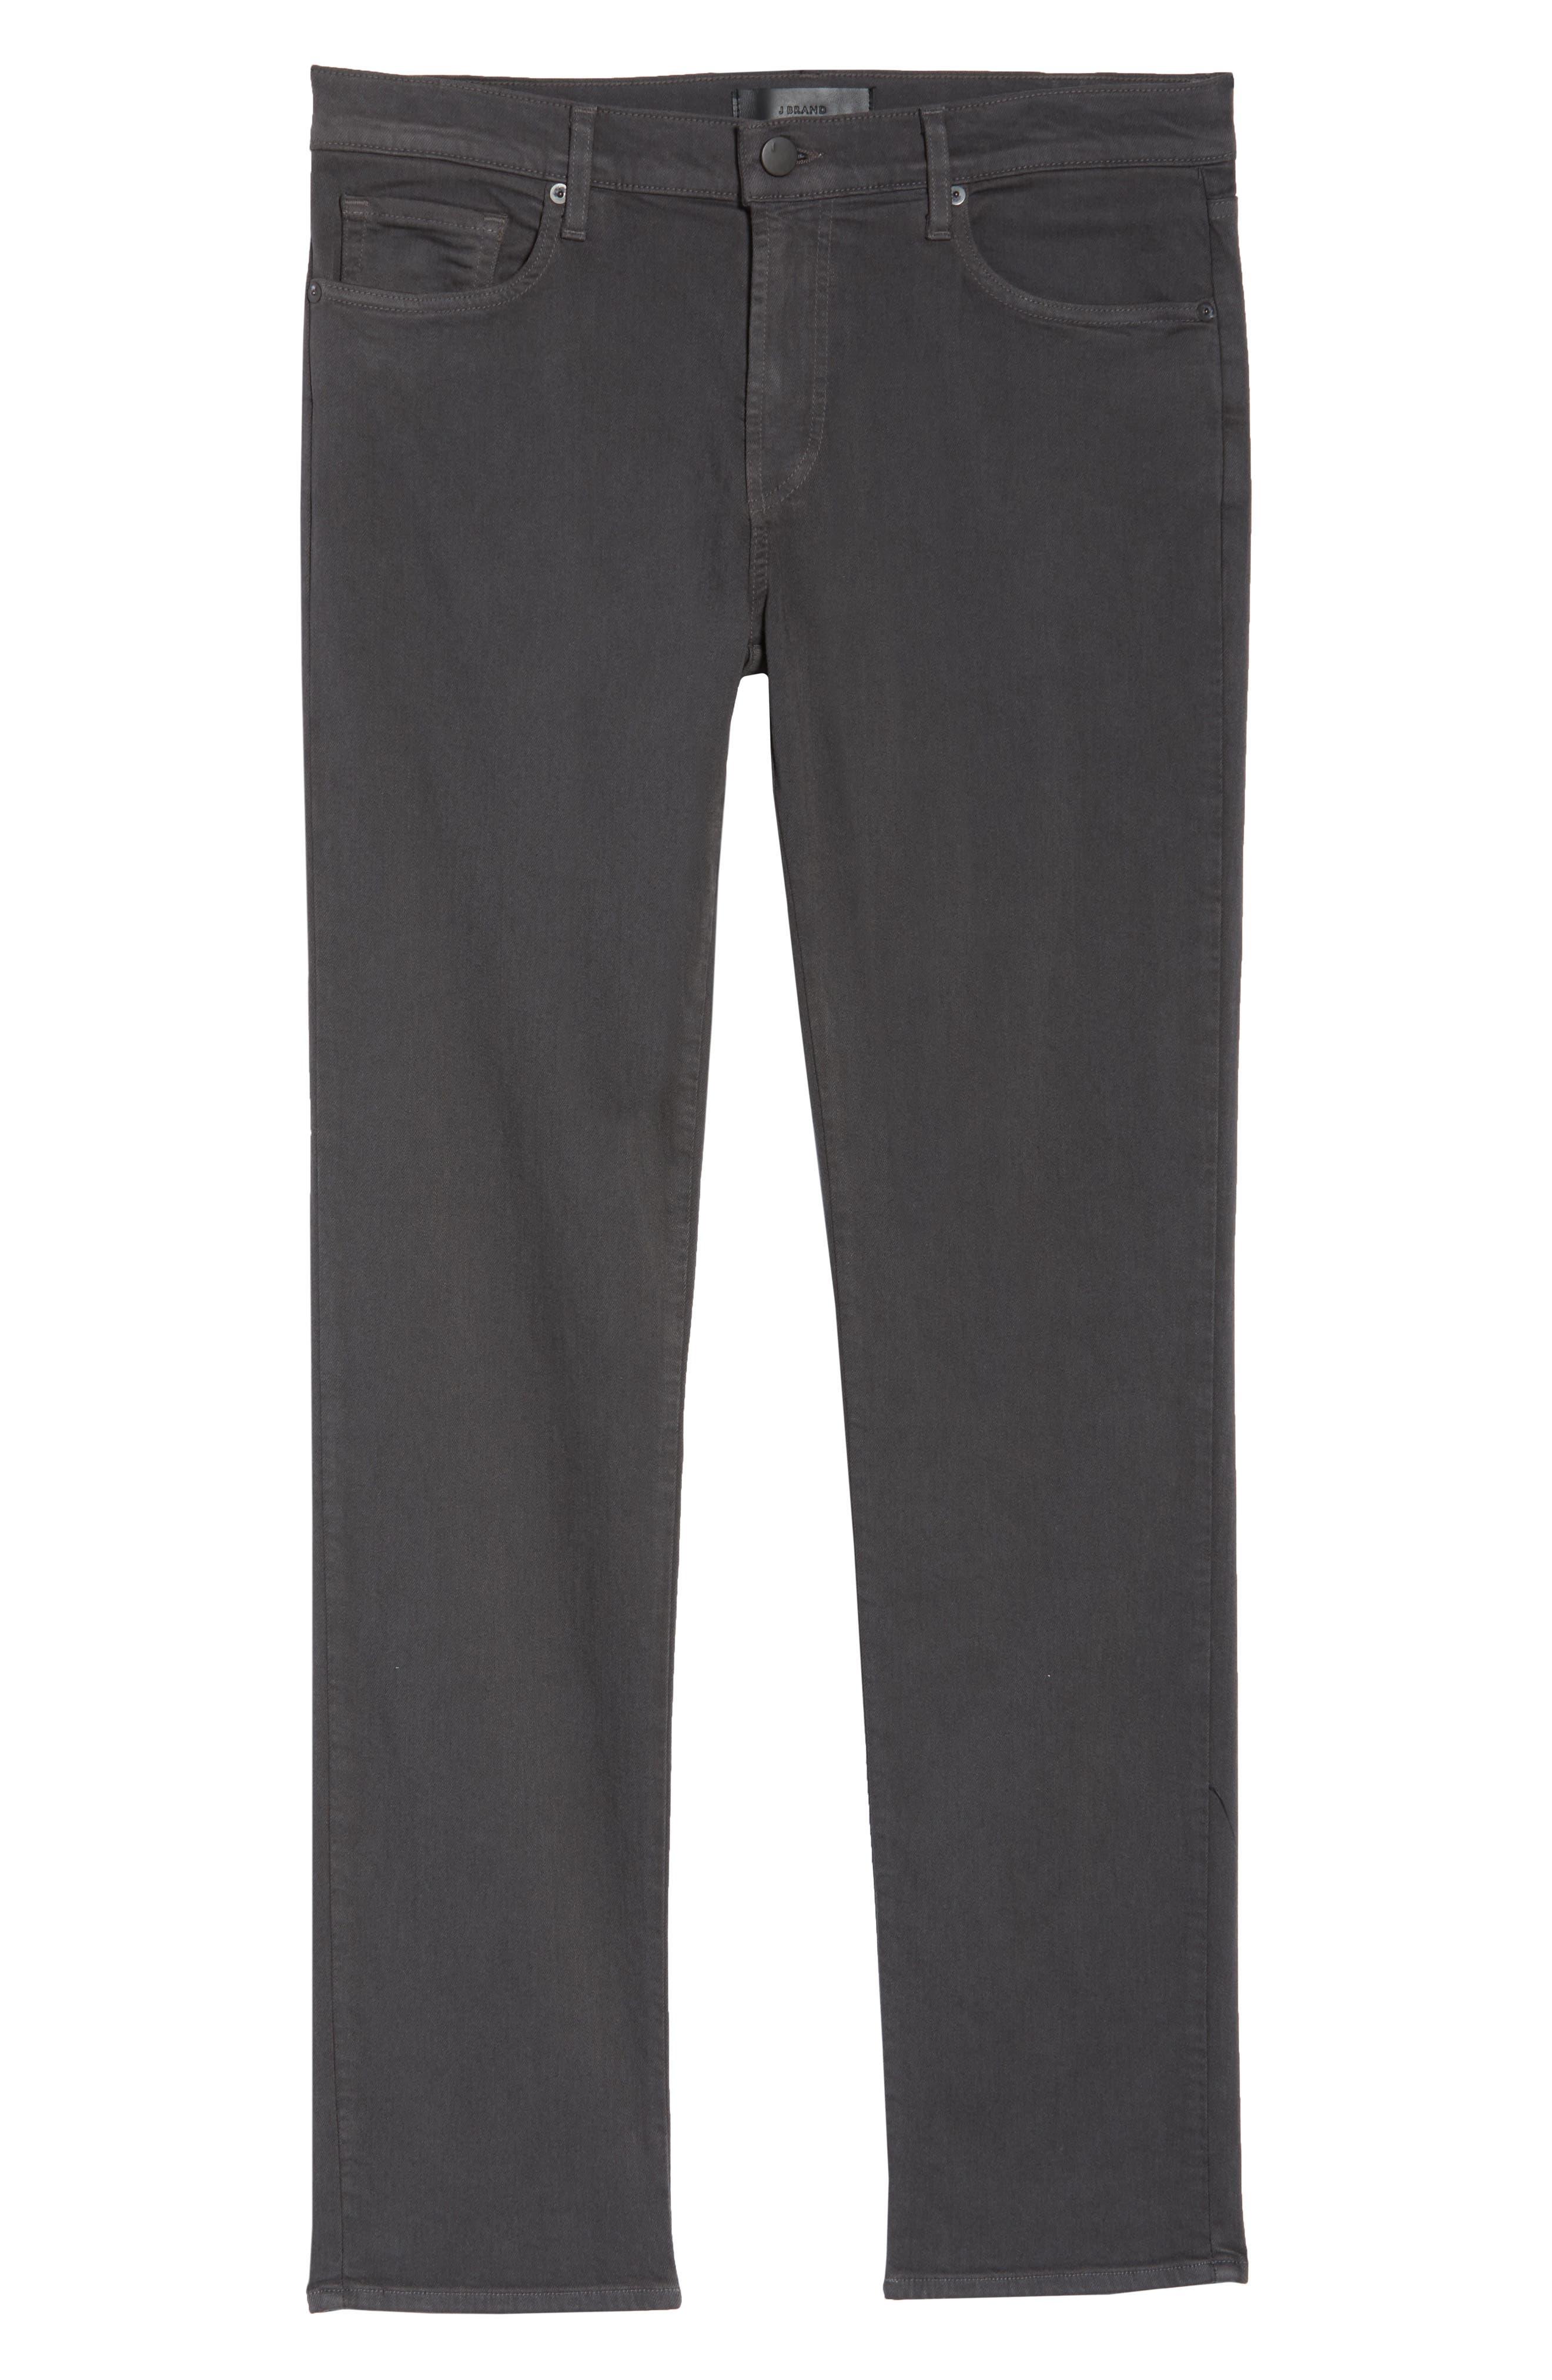 Tyler Slim Fit Jeans,                             Alternate thumbnail 5, color,                             ASPHALT